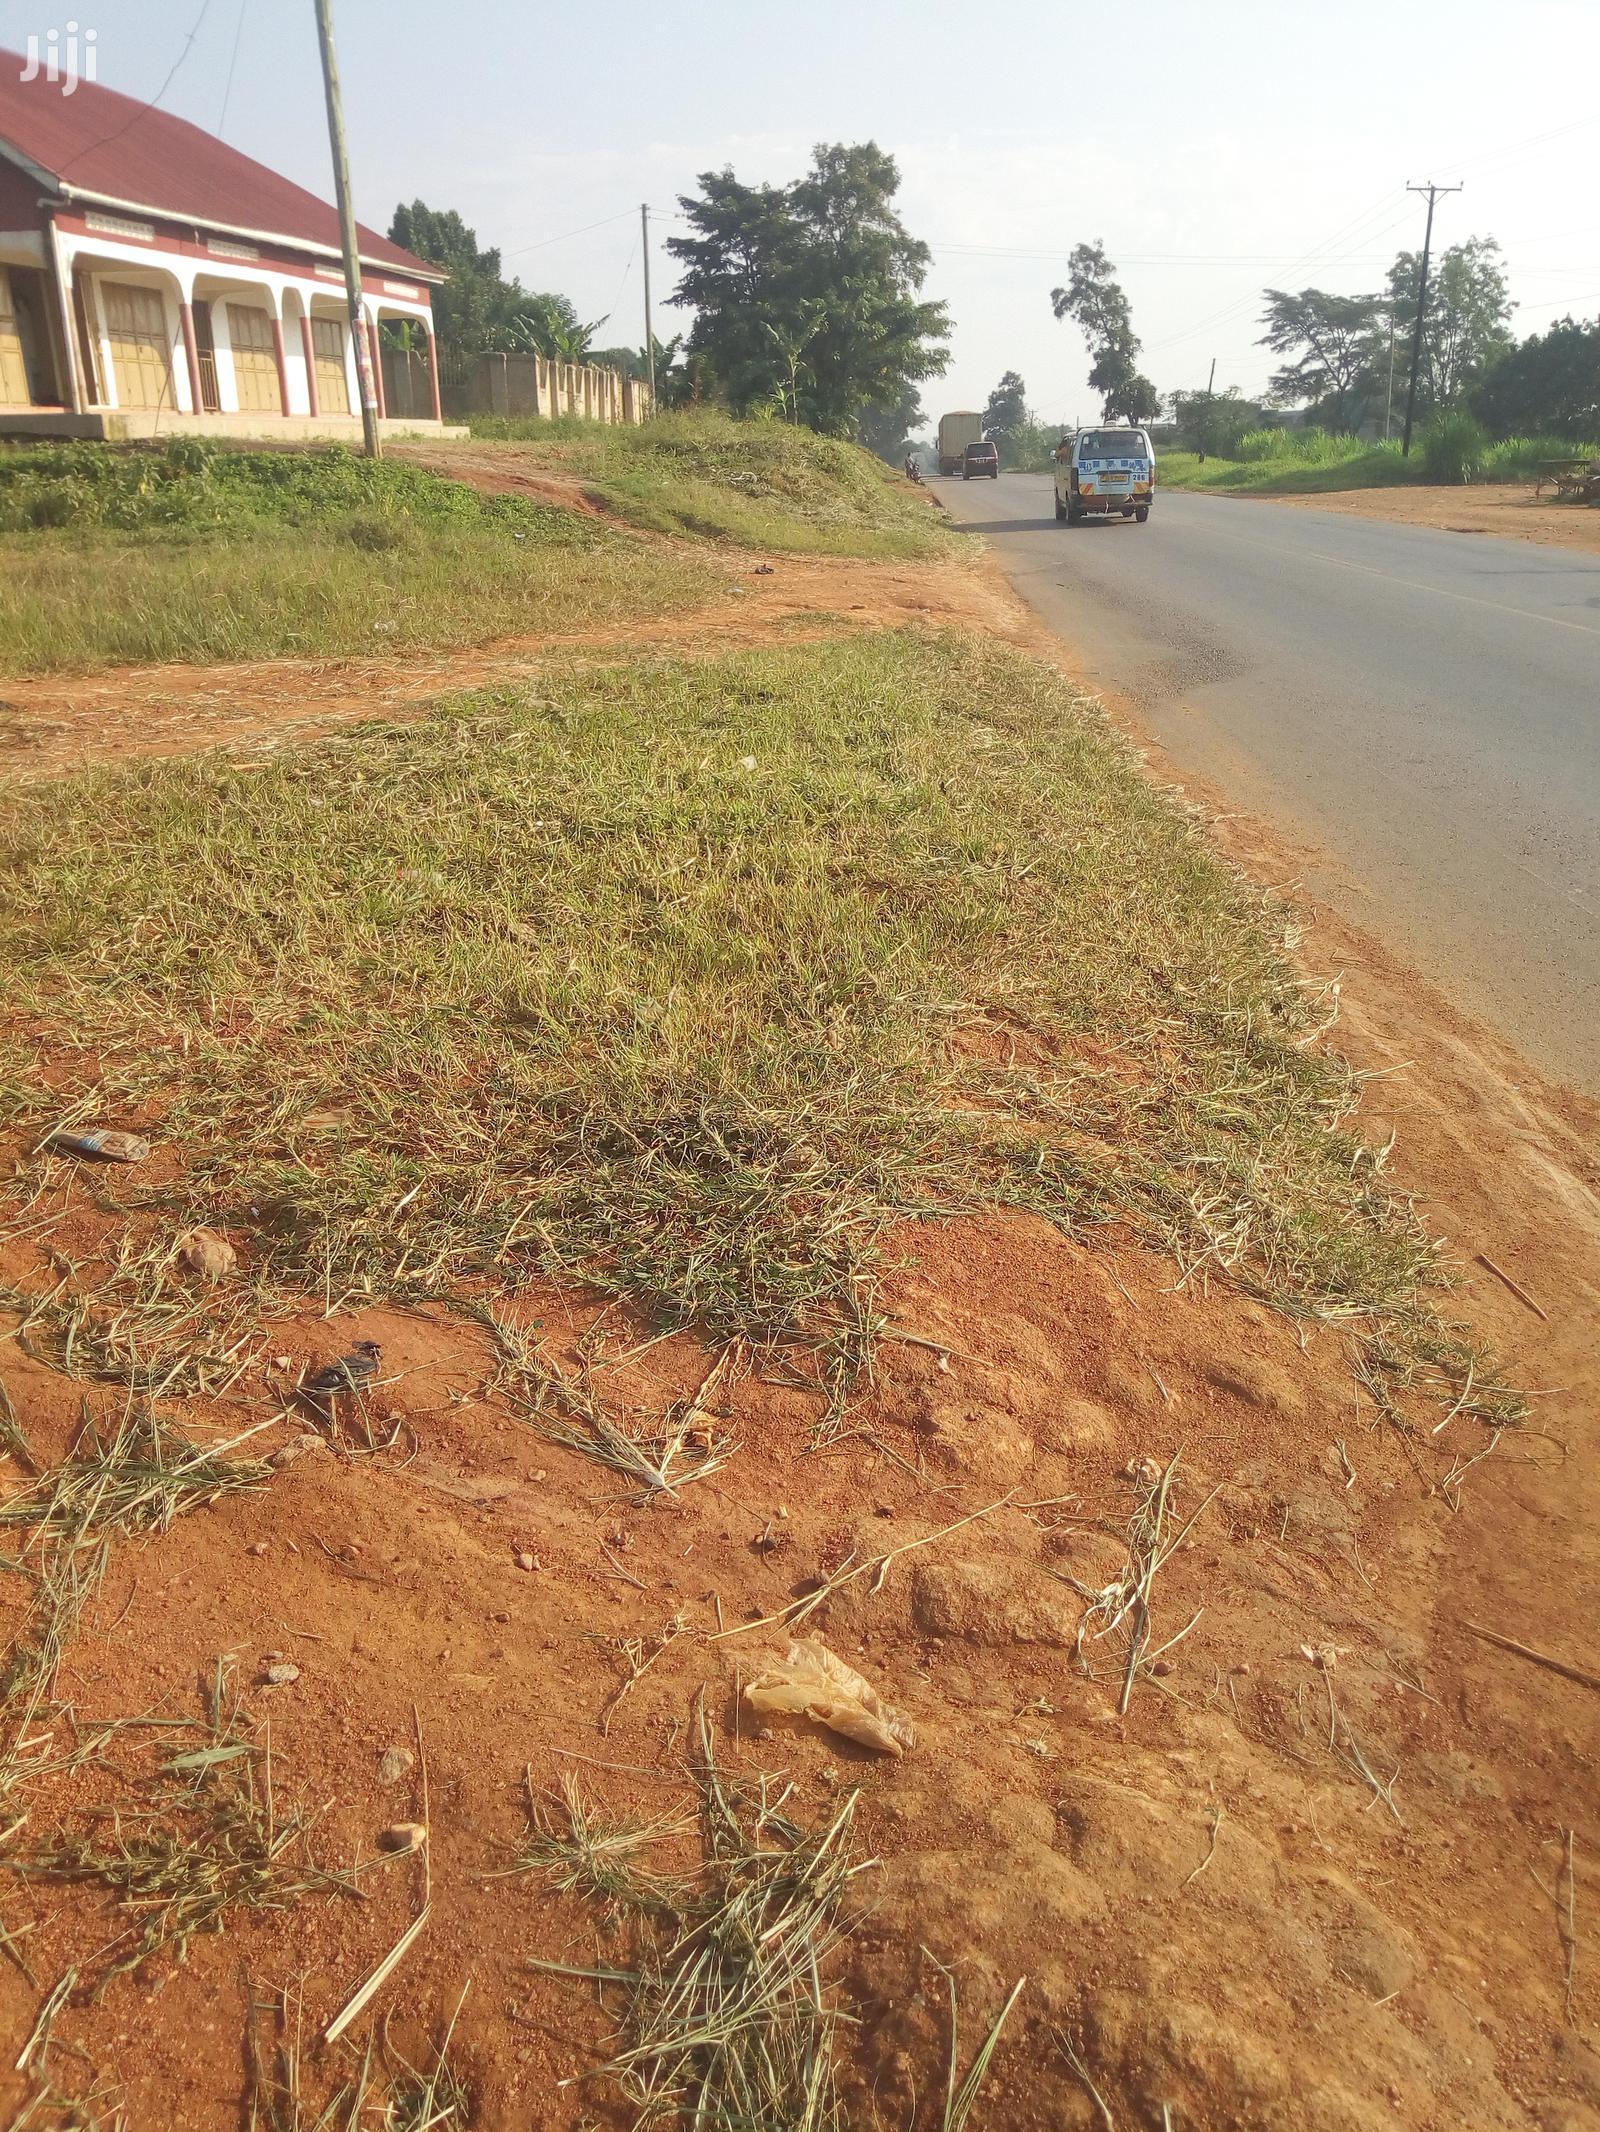 Plots, Land at Wobulenzi for Kats and Deo Surveys LTD